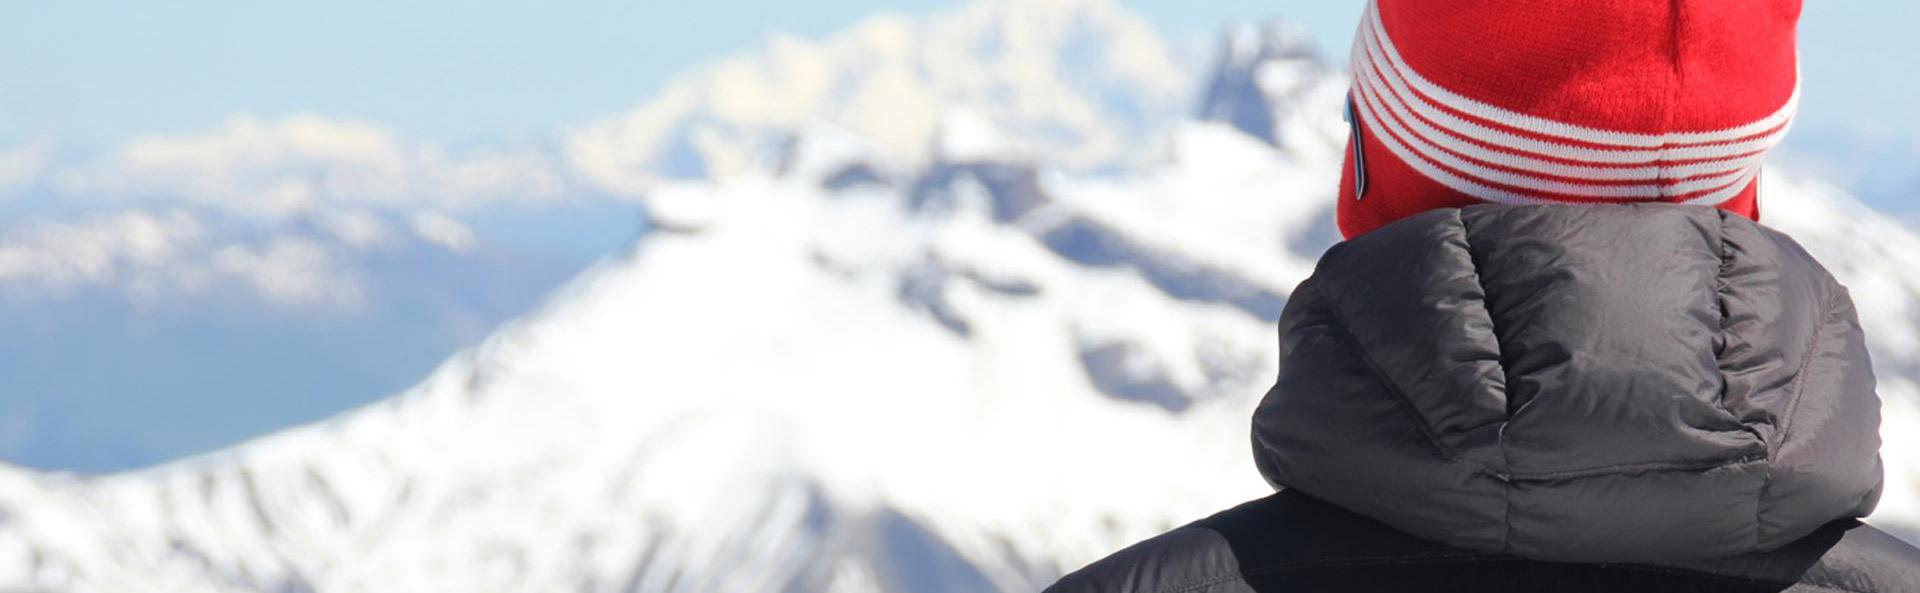 safe_formacion-tecnicos-deportivos-td1-td2-esqui_alpino-snowboard